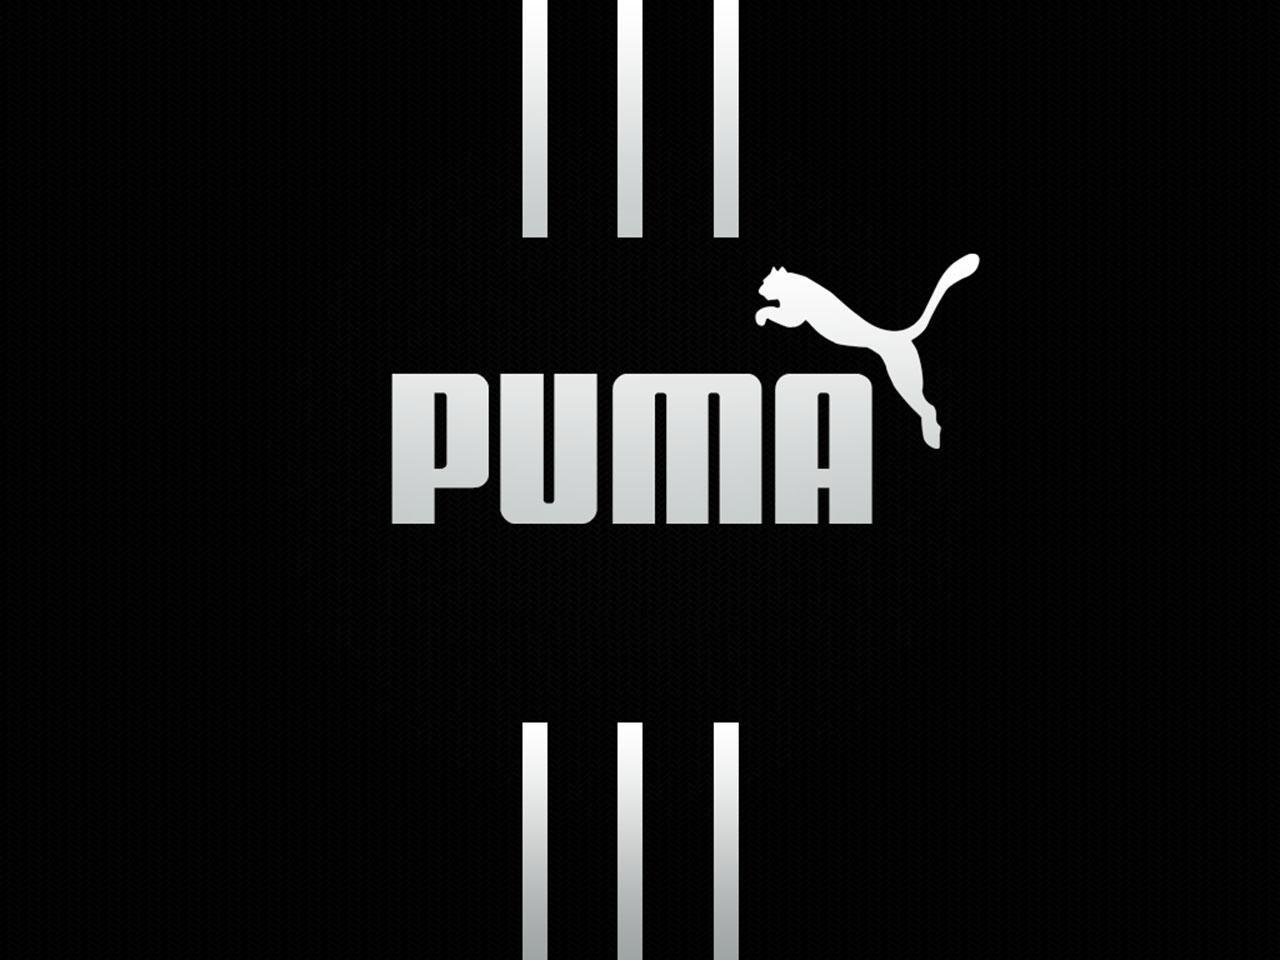 Puma soccer wallpaper